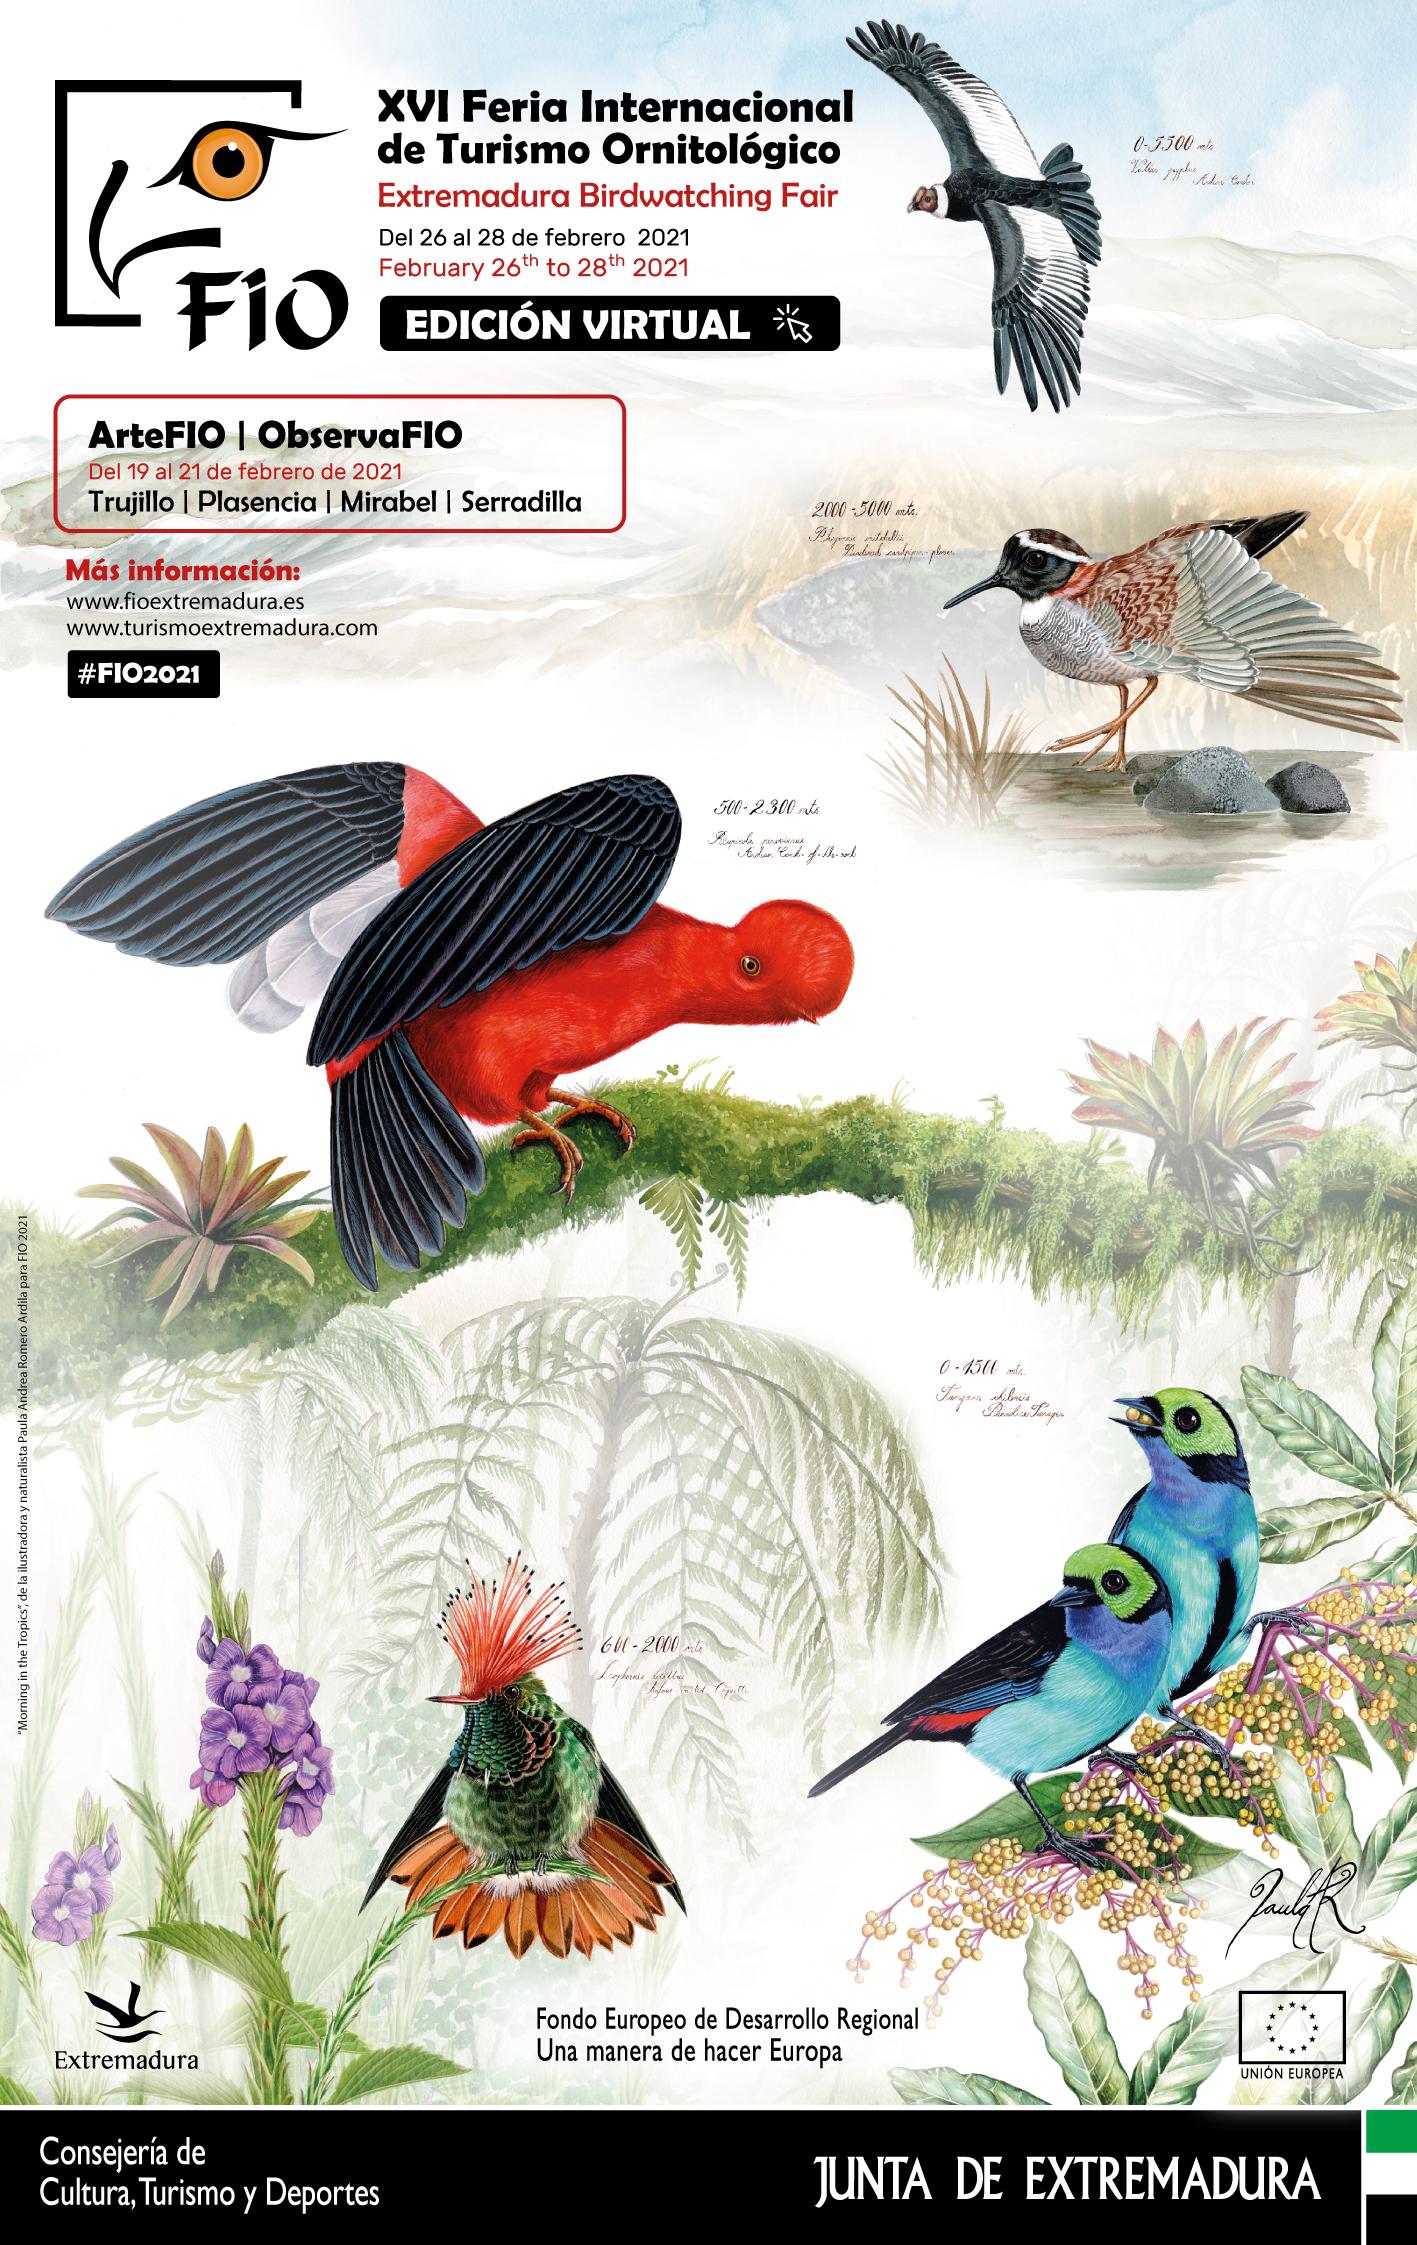 XVI Feria Internacional de Turismo Ornitológico (FIO)